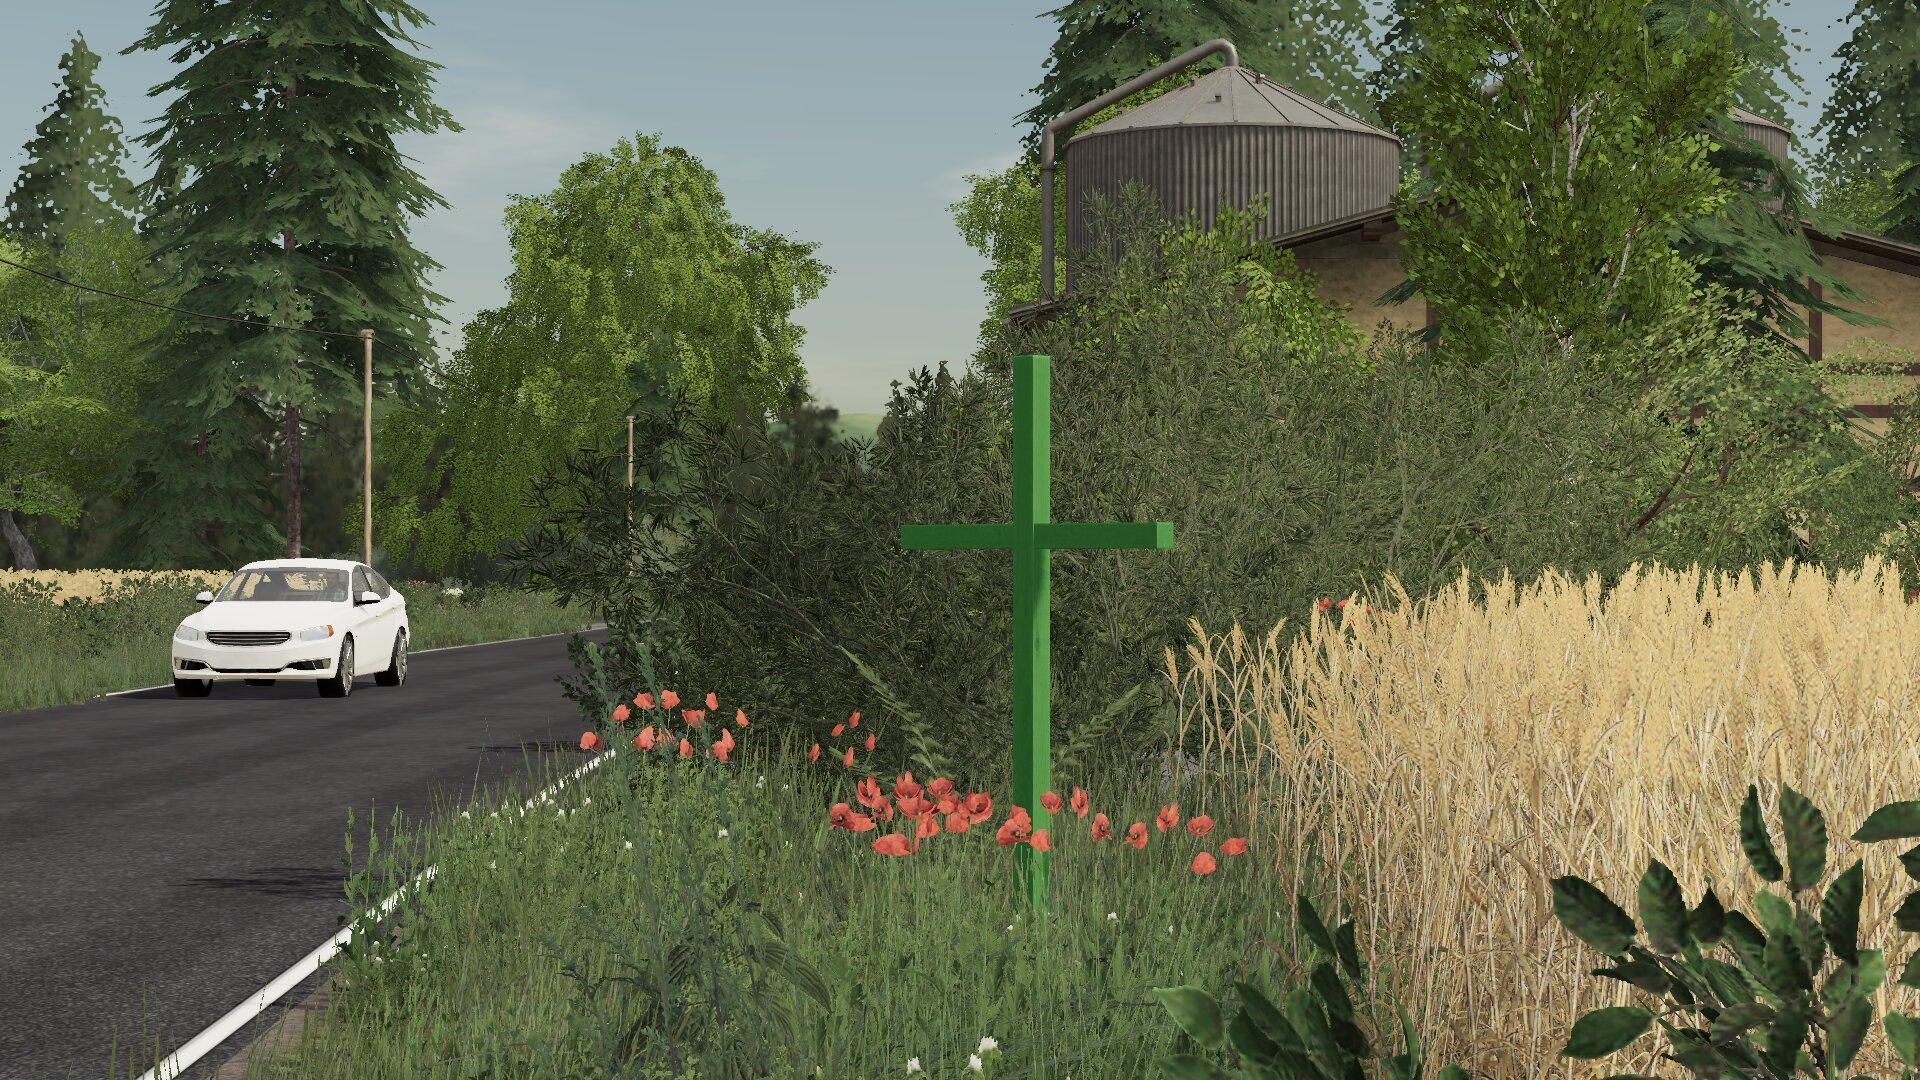 Grünes Kreuz Auf Feldern